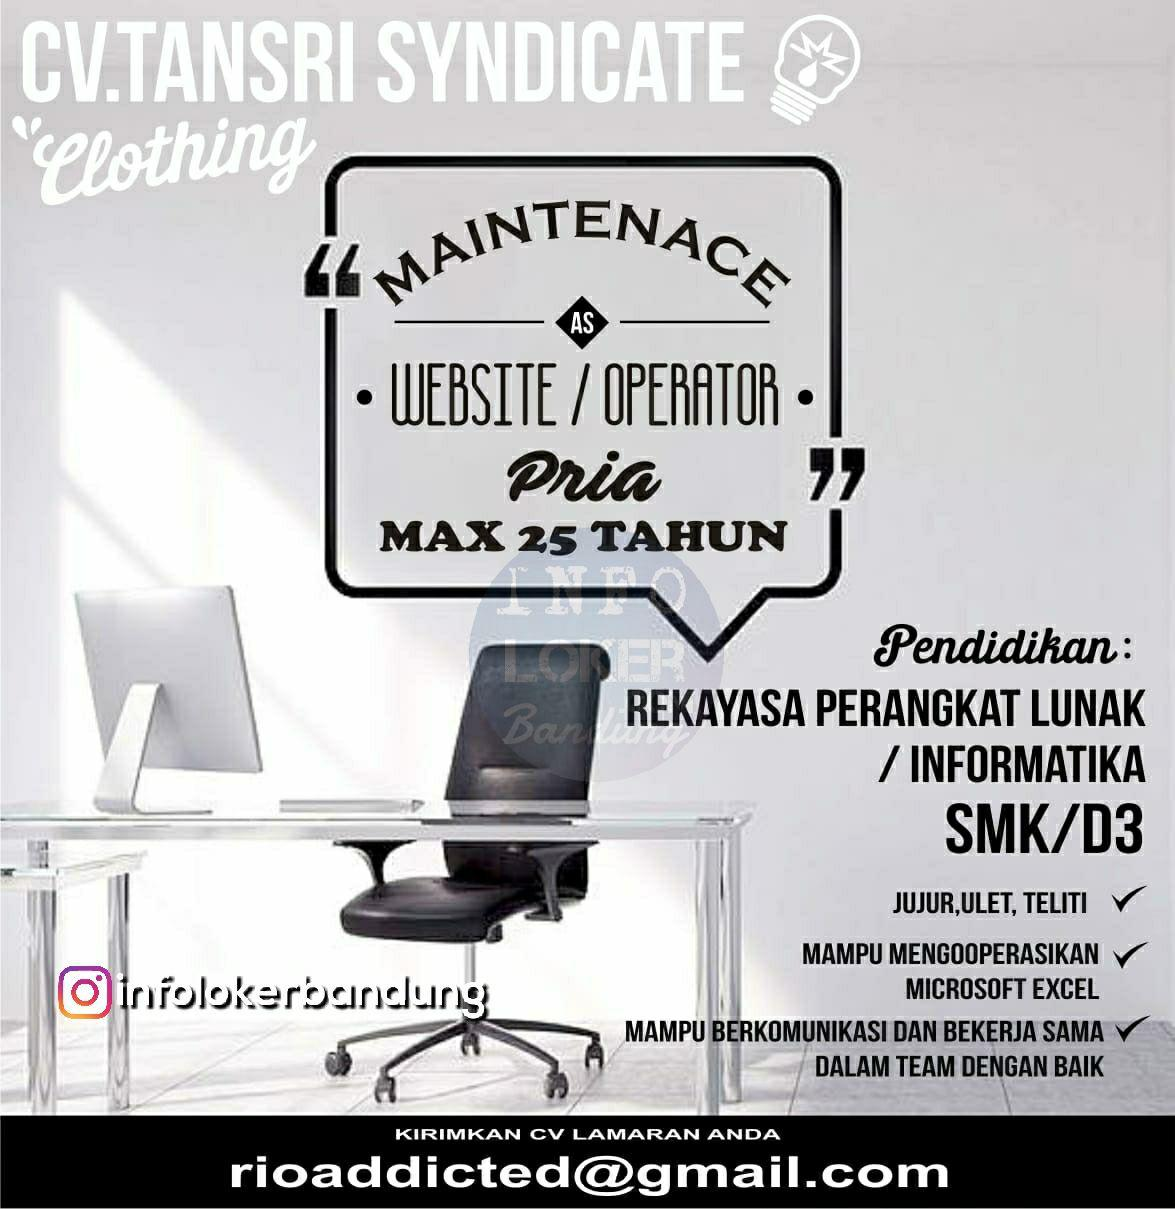 Lowongan Kerja CV. Tansri Syndicate Clothing Bandung November 2018